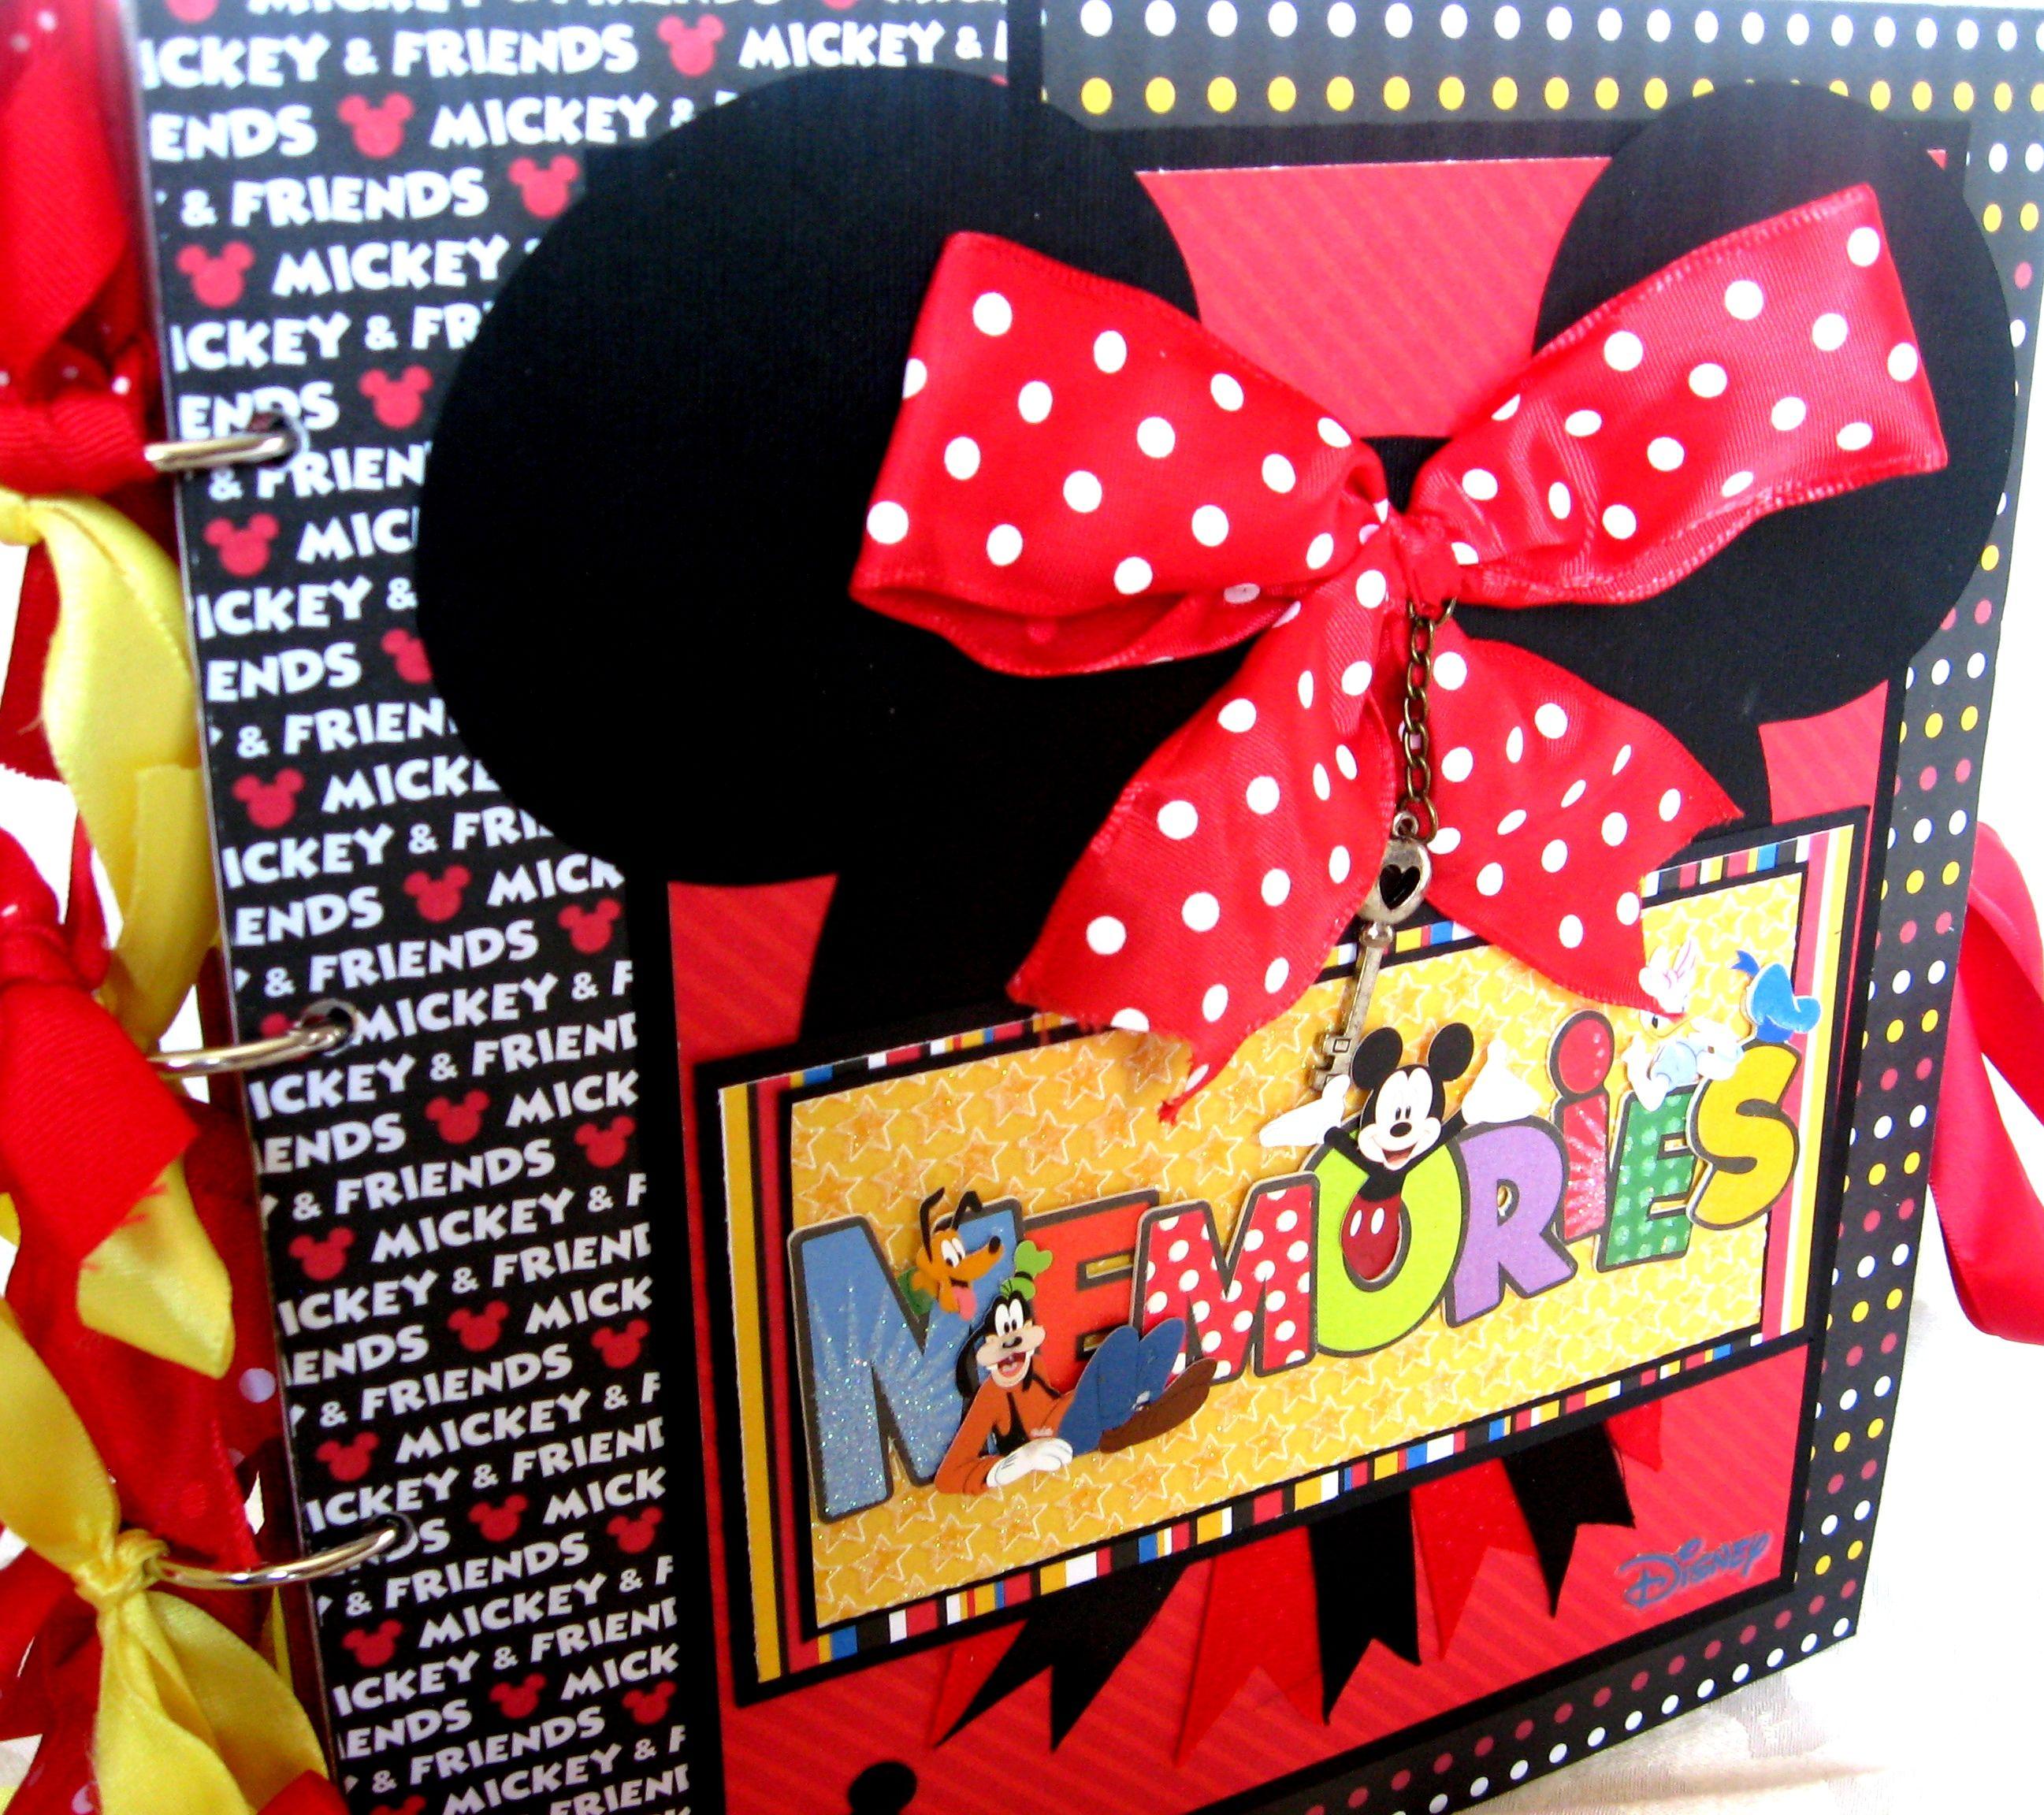 Disney scrapbook ideas - Minnie Mouse Scrapbook Album